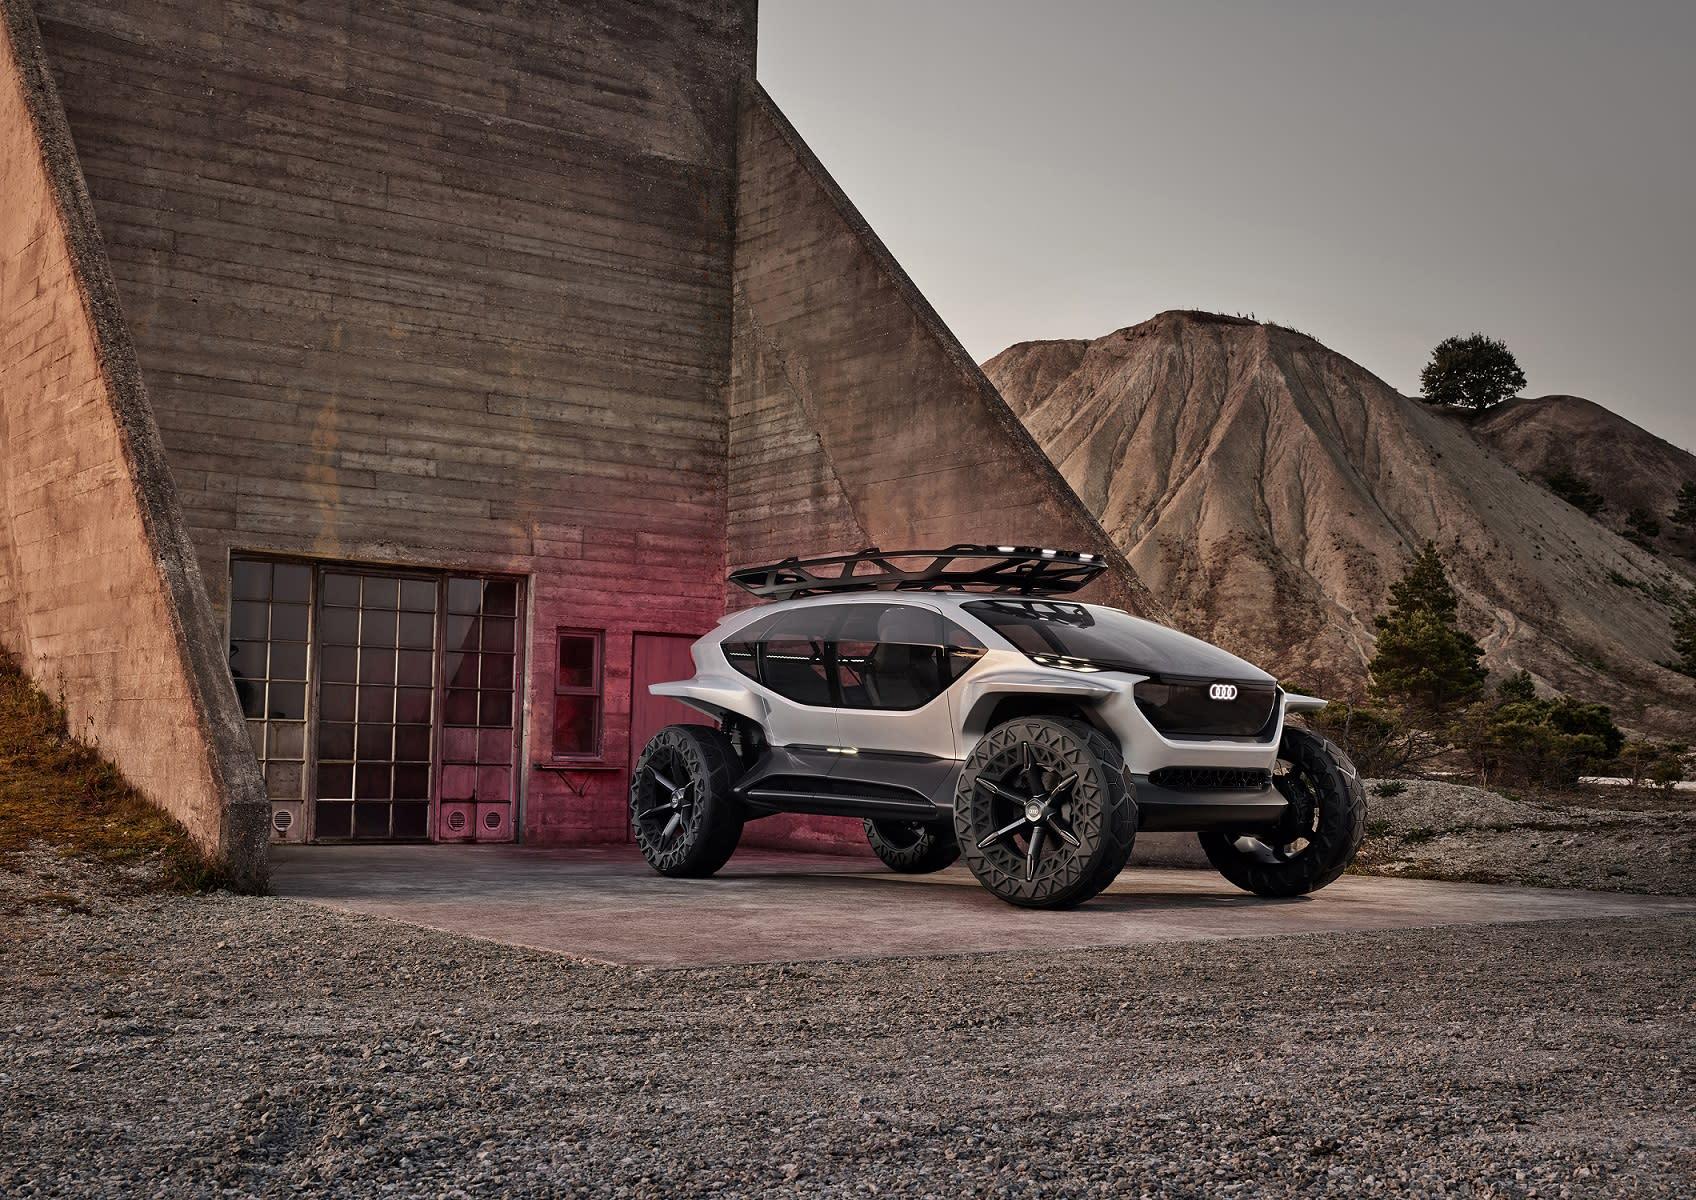 The Audi AI:TRAIL quattro